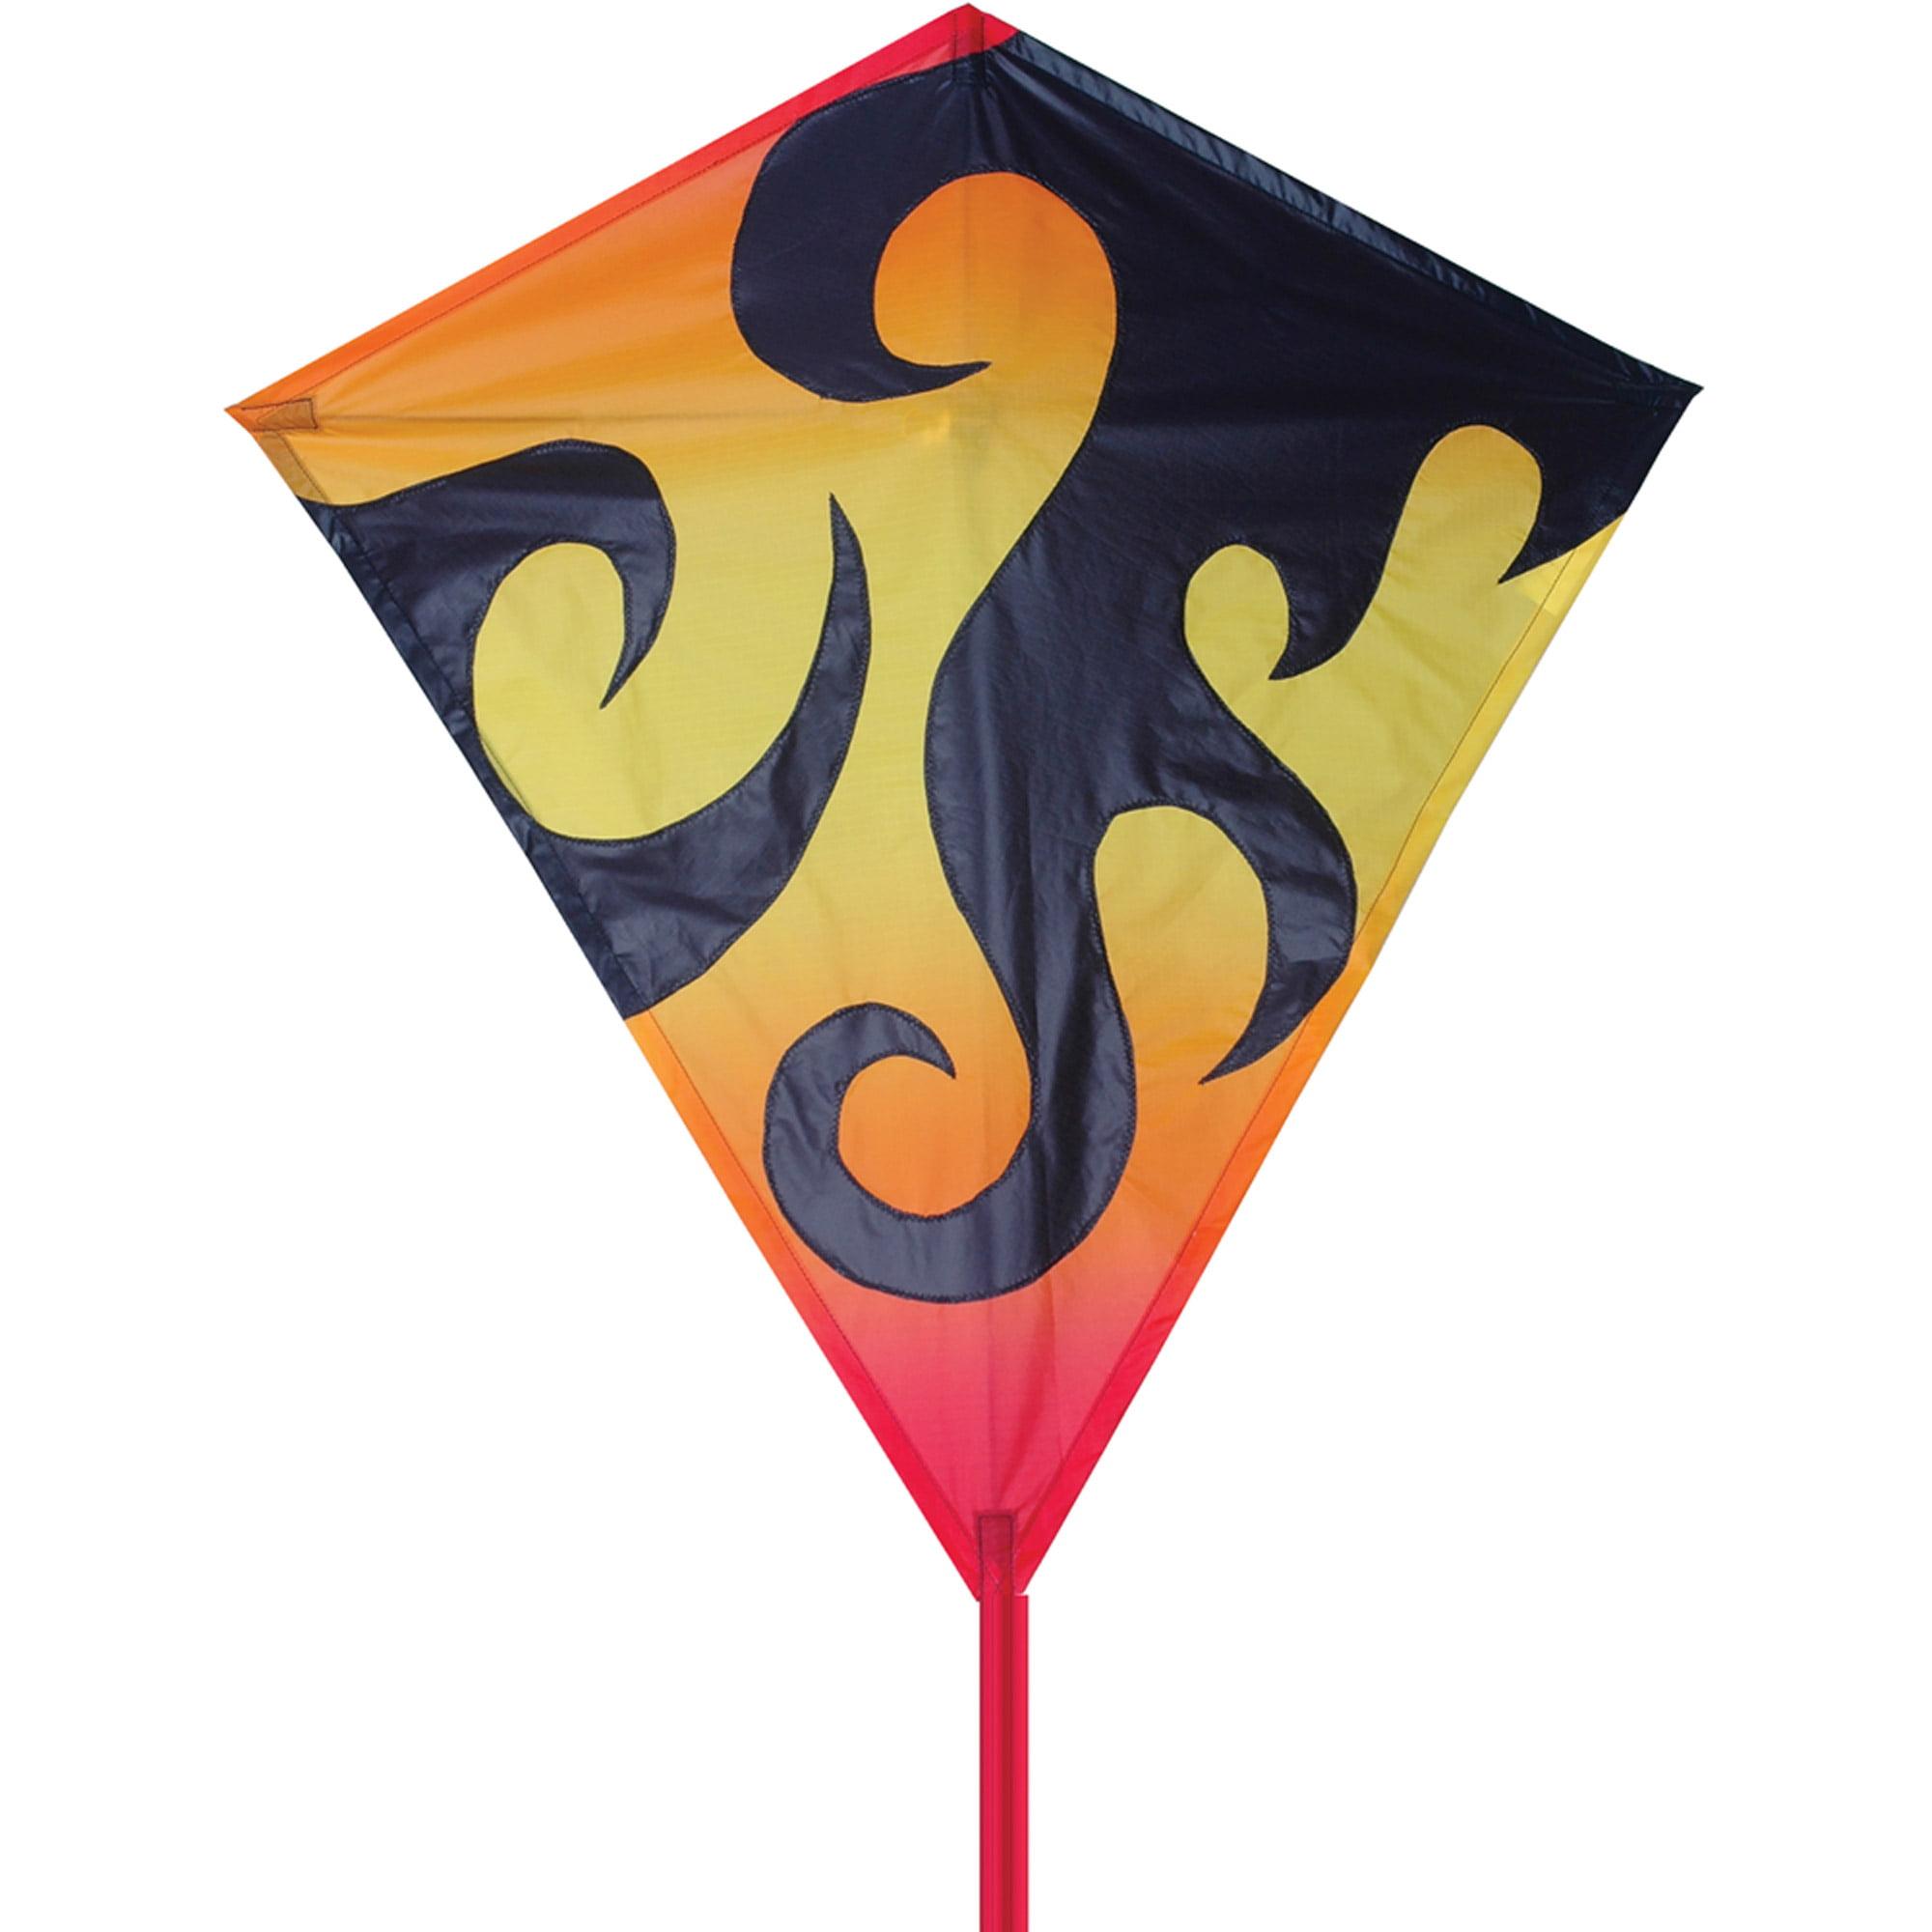 "Premier Designs 30"" Diamond Kite, Hot Flames"